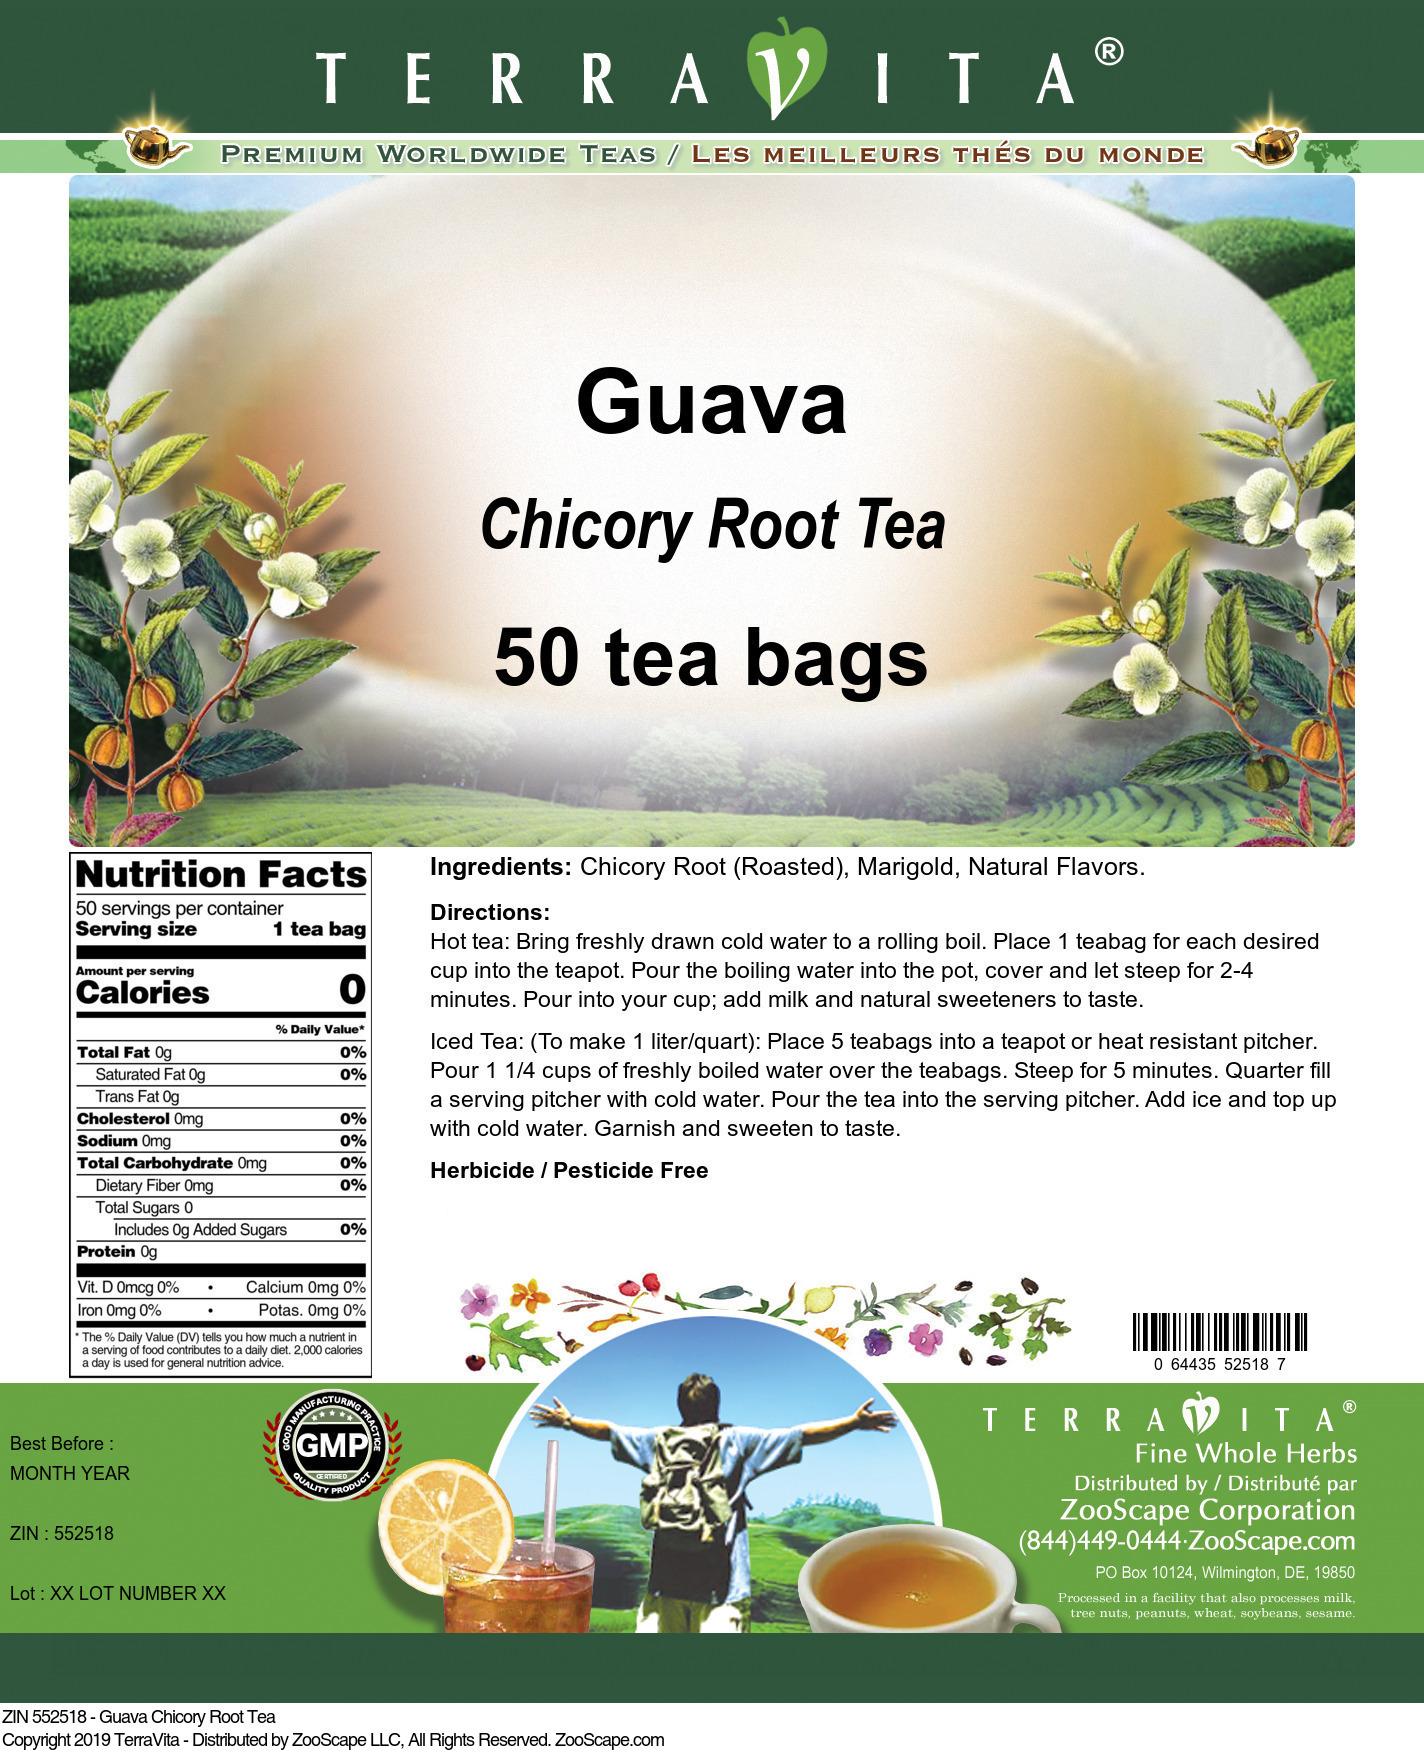 Guava Chicory Root Tea